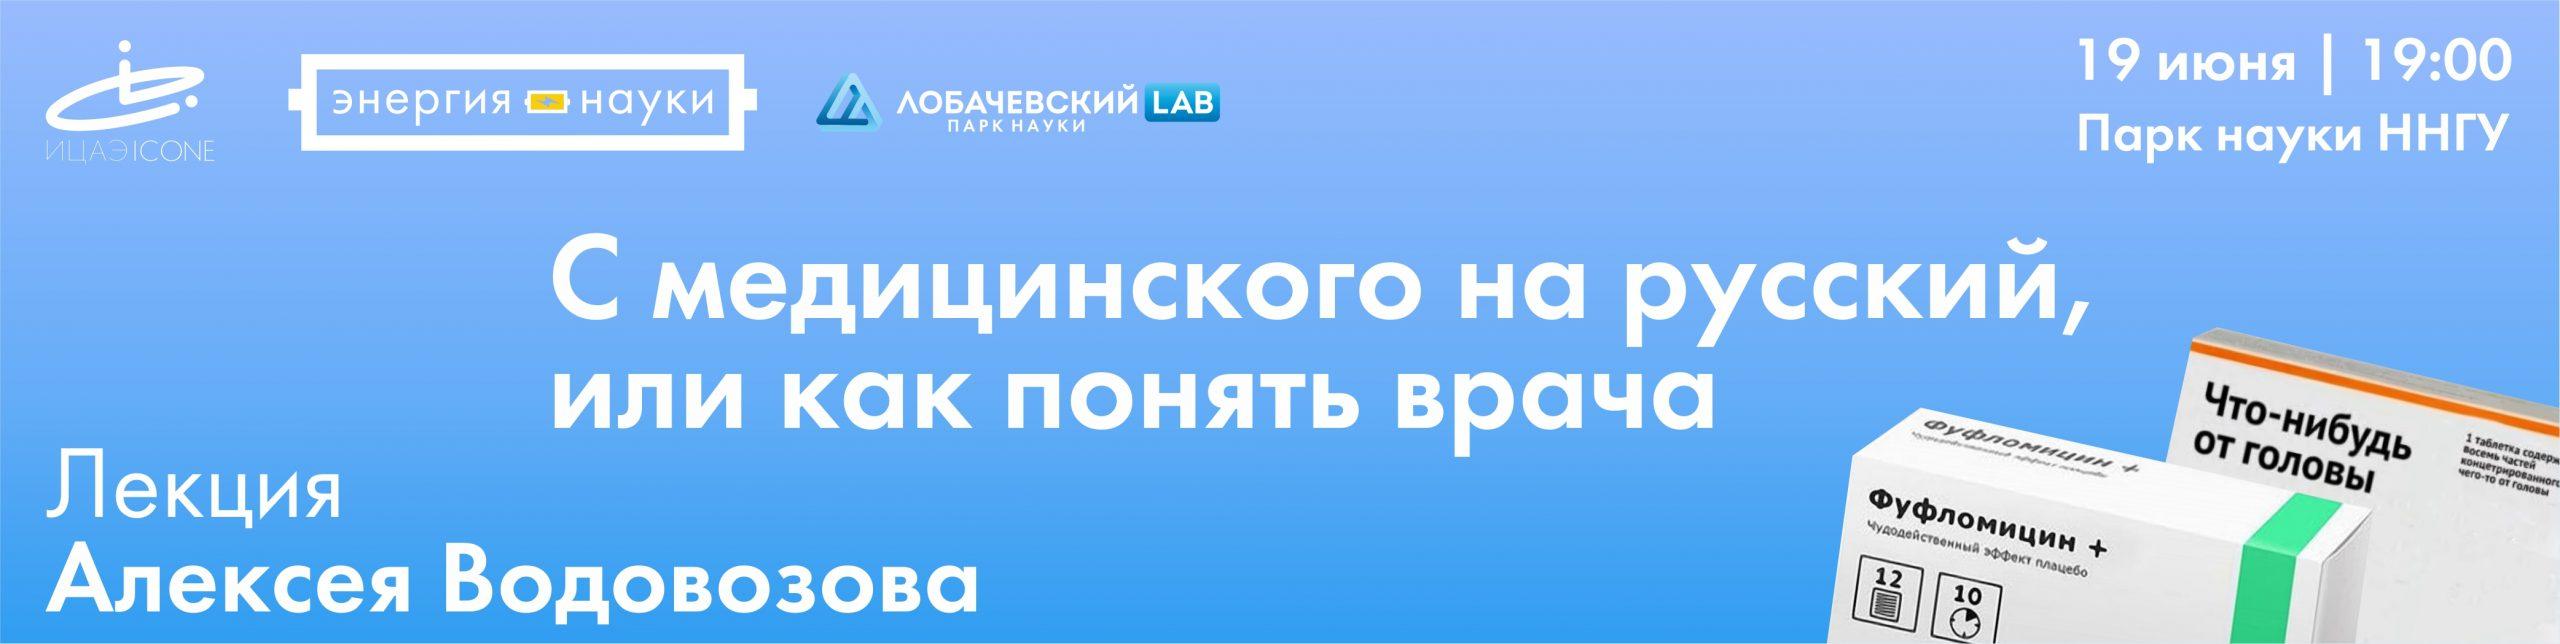 Лекция Алексея Водовозова «С медицинского на русский»